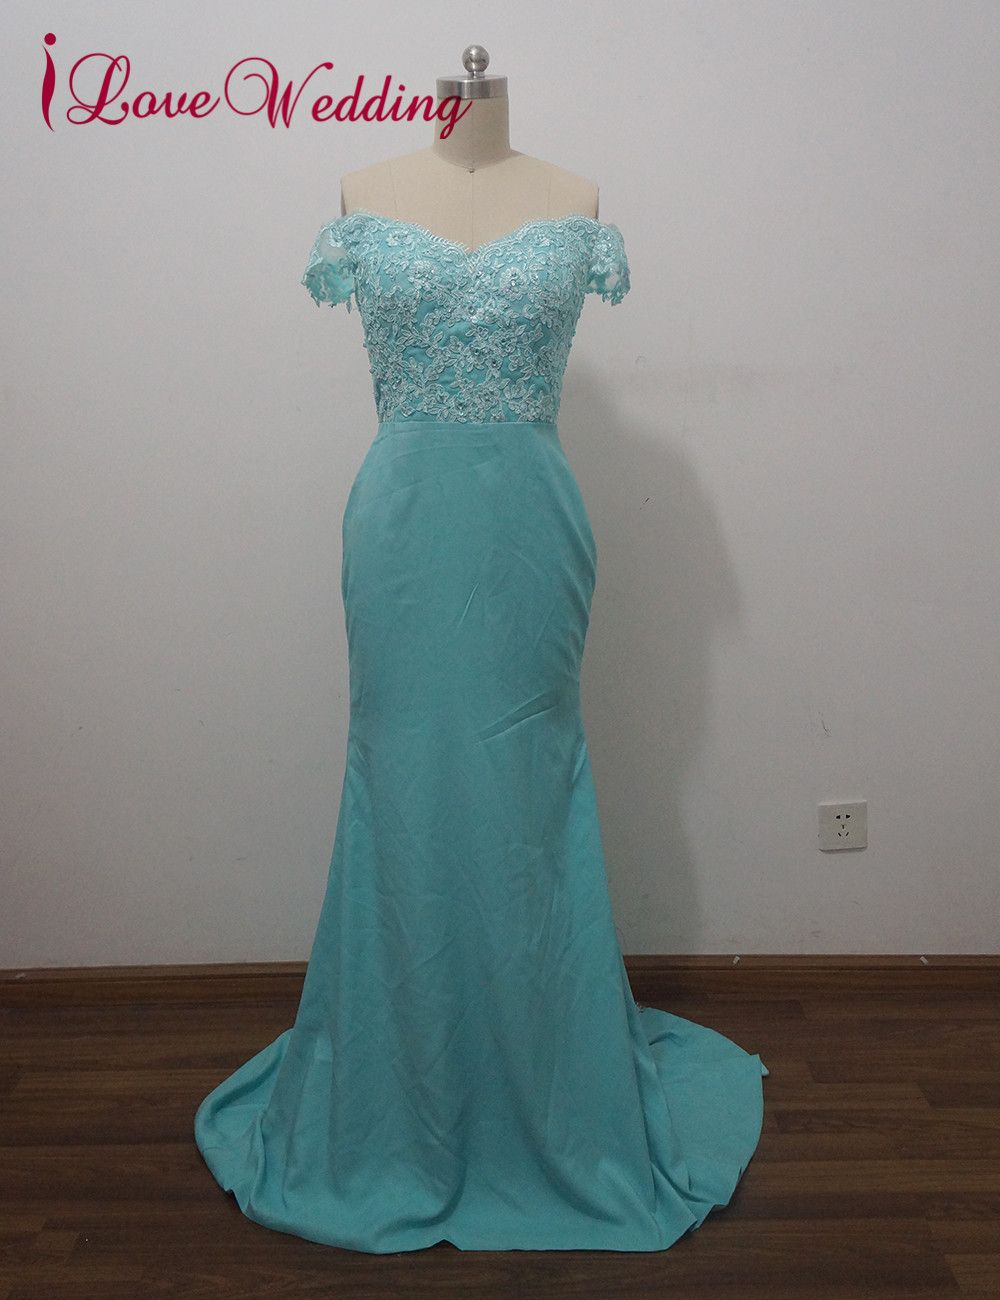 Ilovewedding mermaid evening dresses formal sweetheart appliques